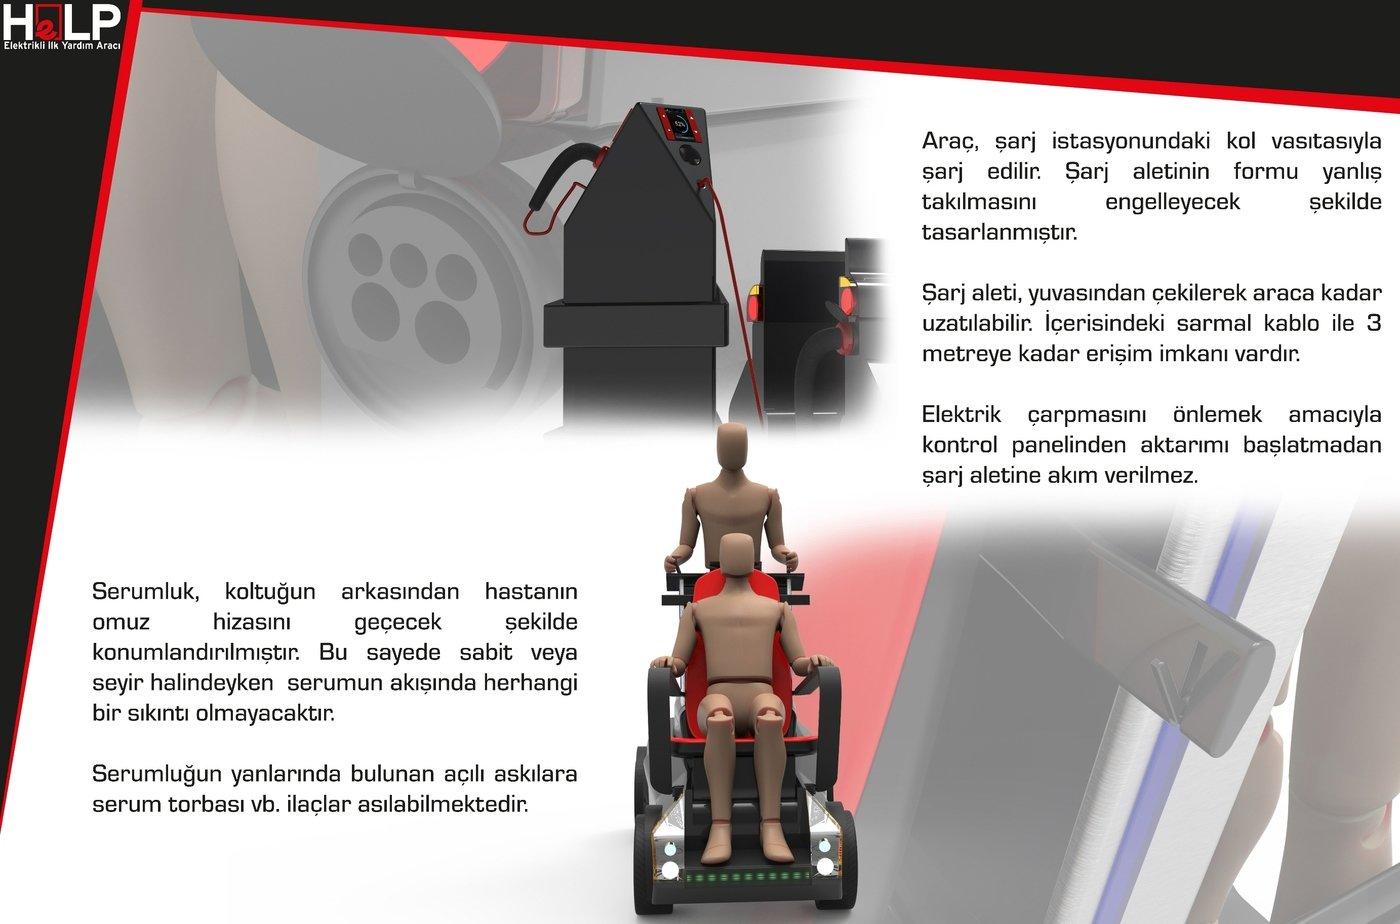 HeLP Electrical Emergency Vehicle by Alperen Tunçeli at